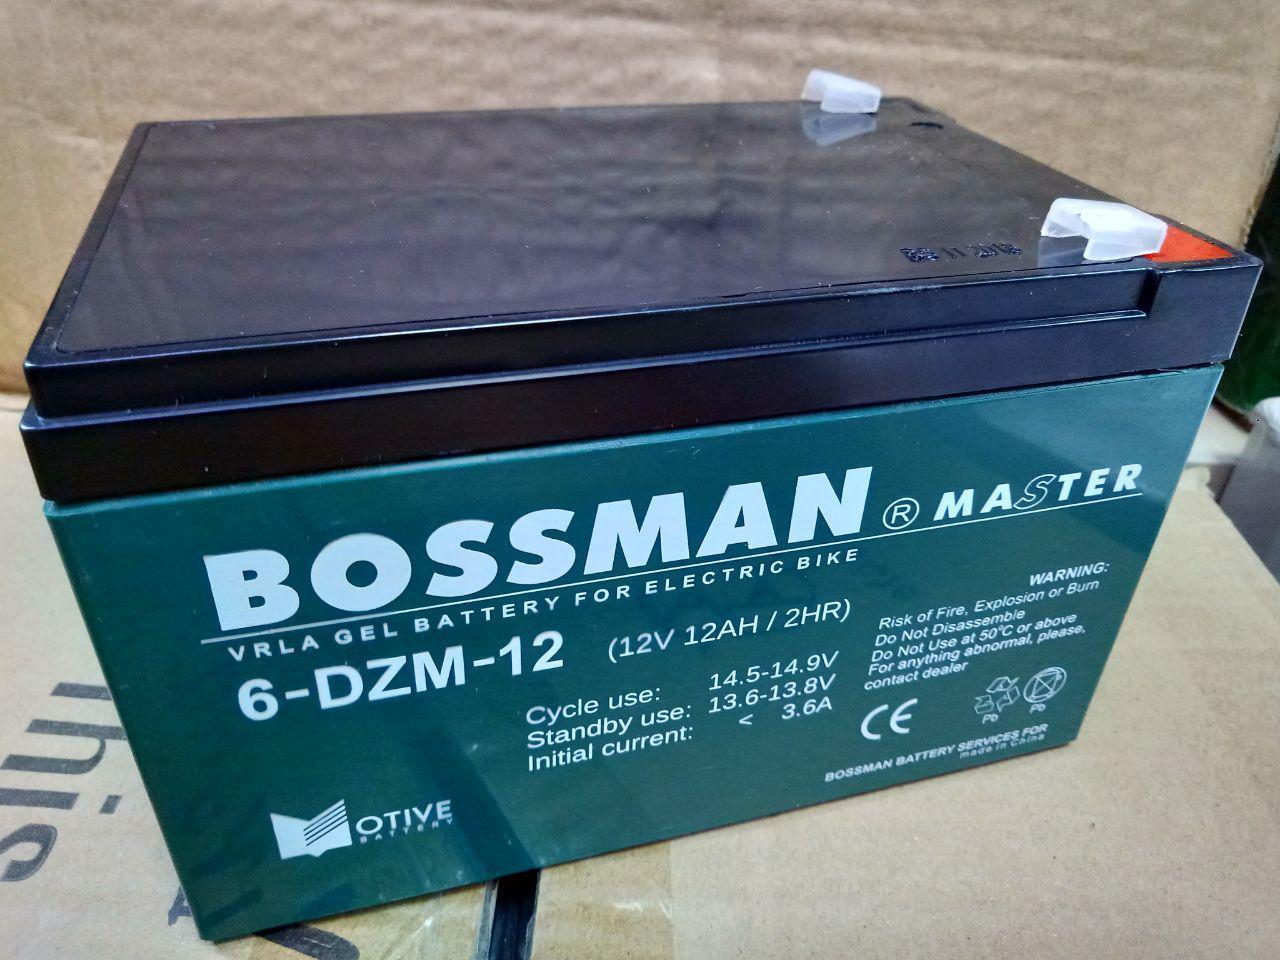 Тяговый аккумулятор Bossman Master 6DZM12 - GEL 12V 12Ah